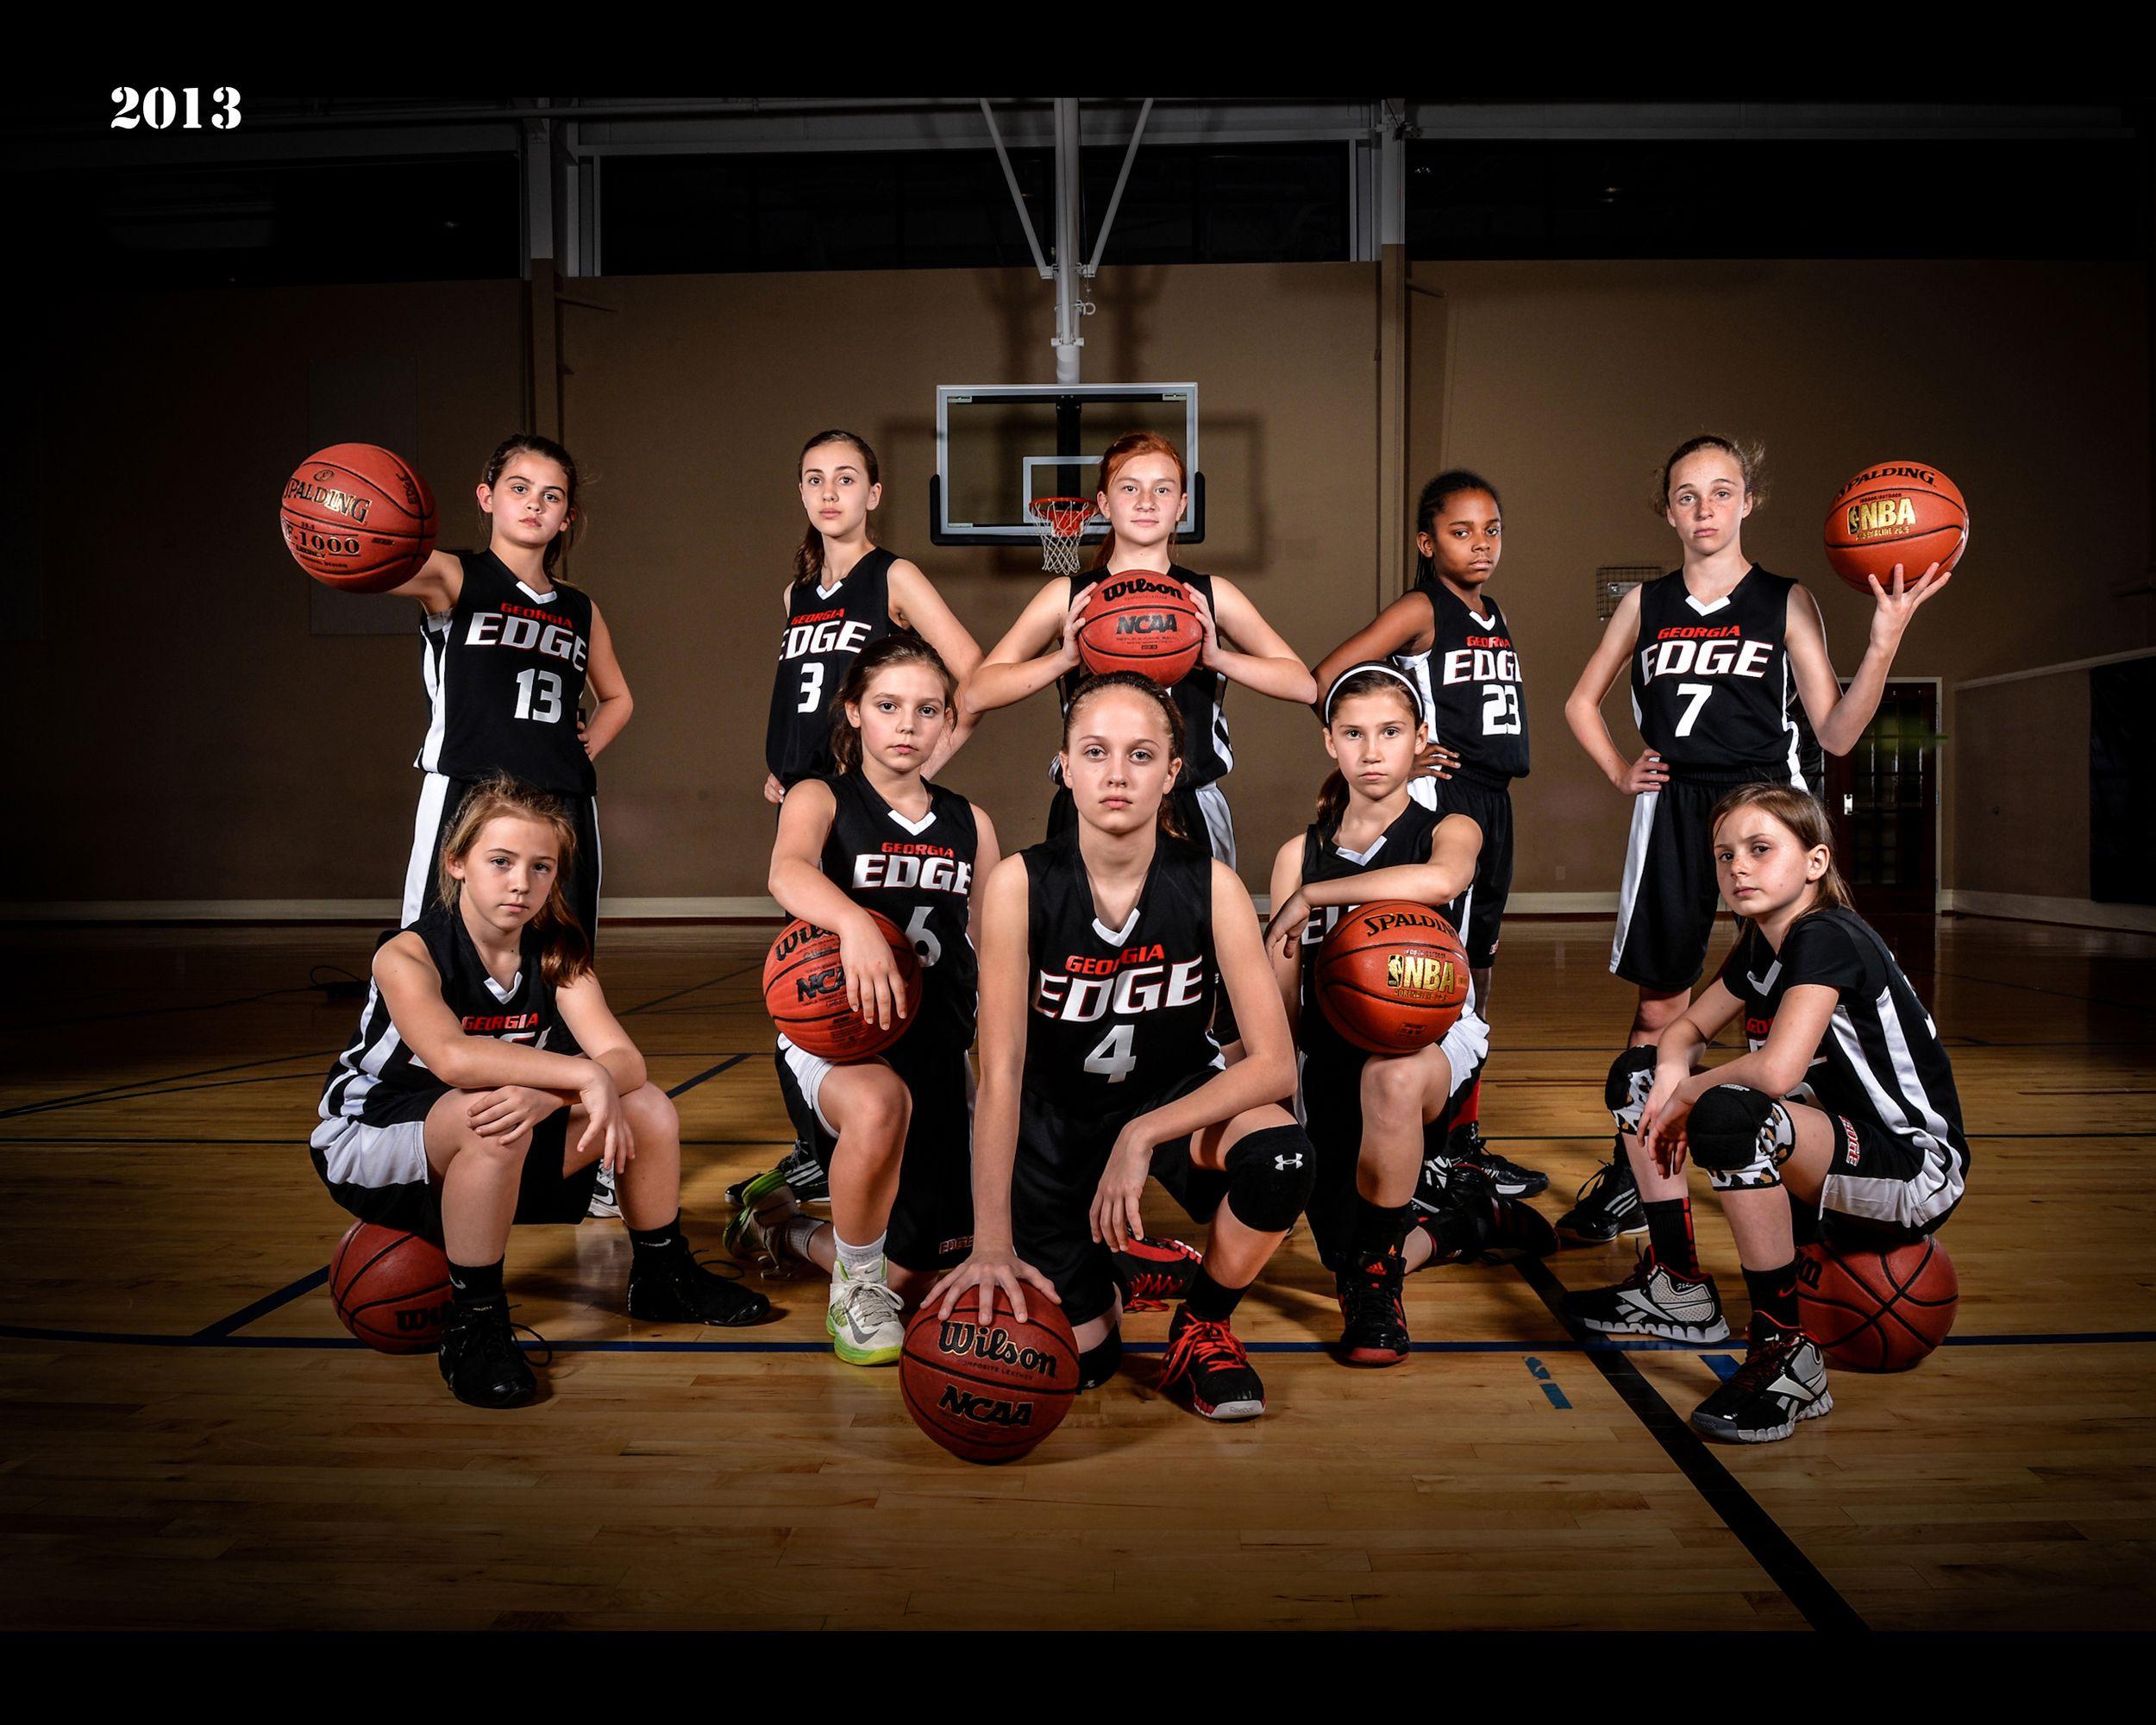 girls basketb pantherettes pose - HD2500×2000